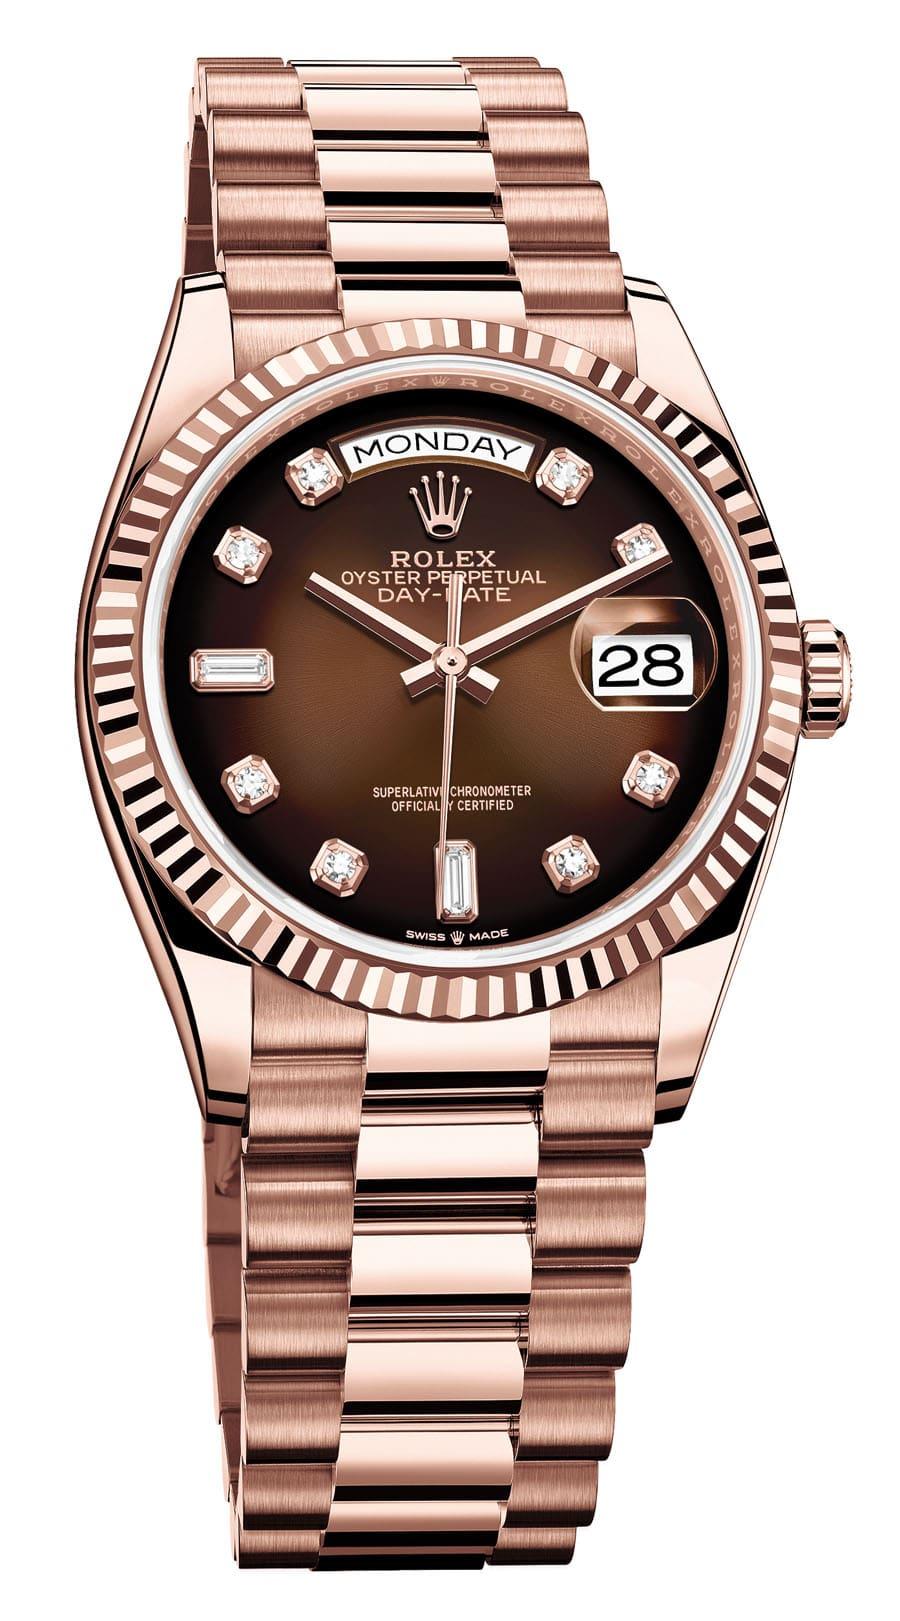 Rolex: Oyster Perpetual Day-Date 36 Everose mit braunem Ombré-Zifferblatt